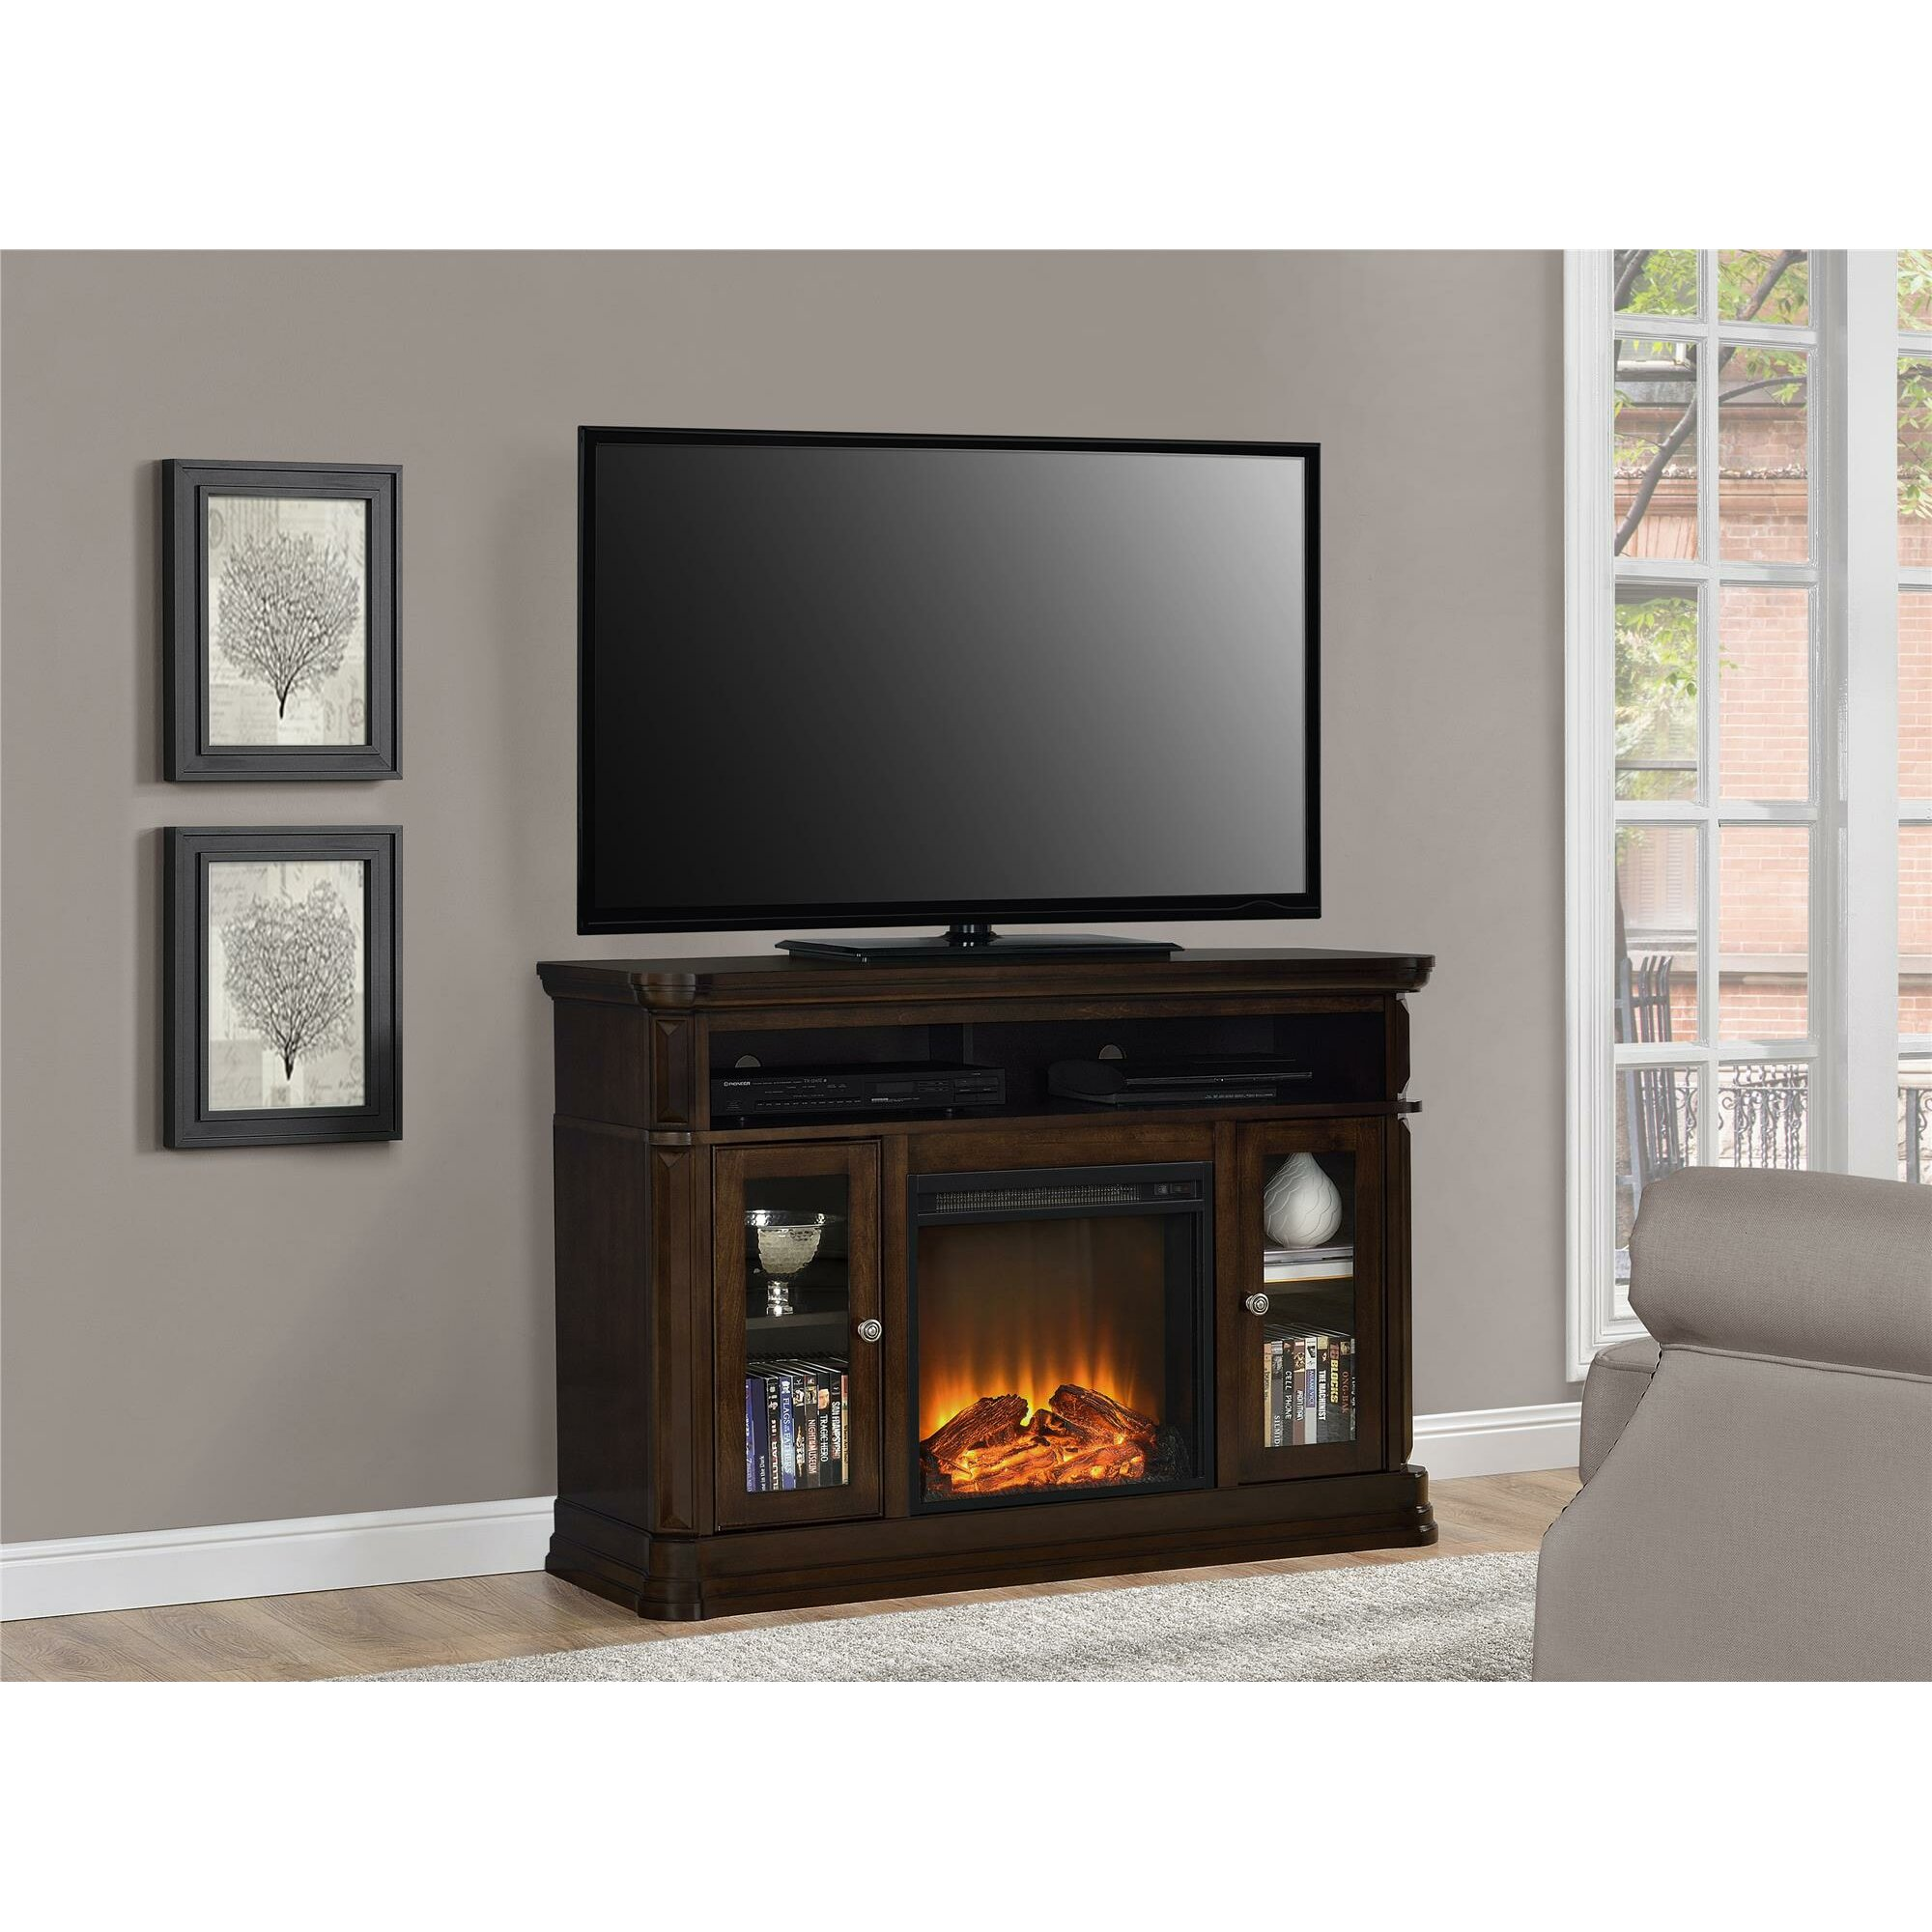 Astoria Grand Ganado 473 TV Stand with Electric Fireplace